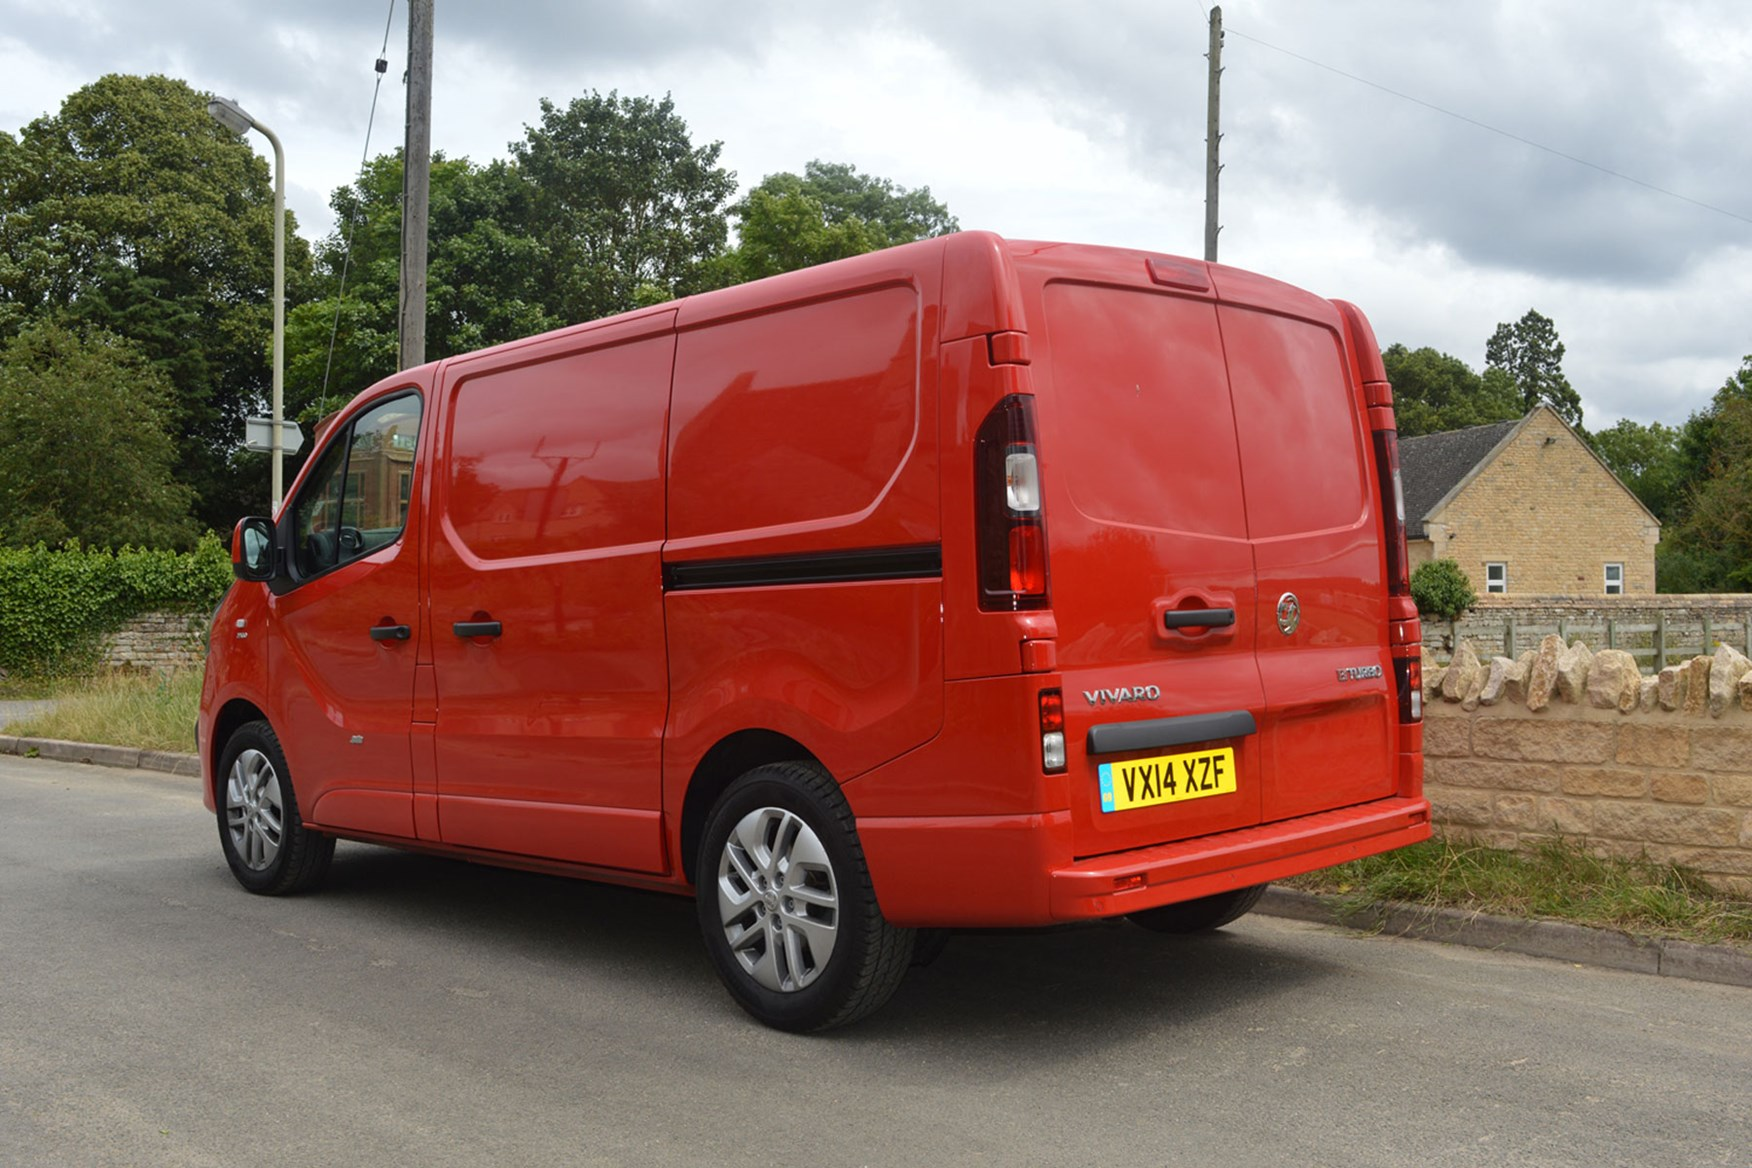 Vauxhall Vivaro Sportive EU5 review - rear view, red